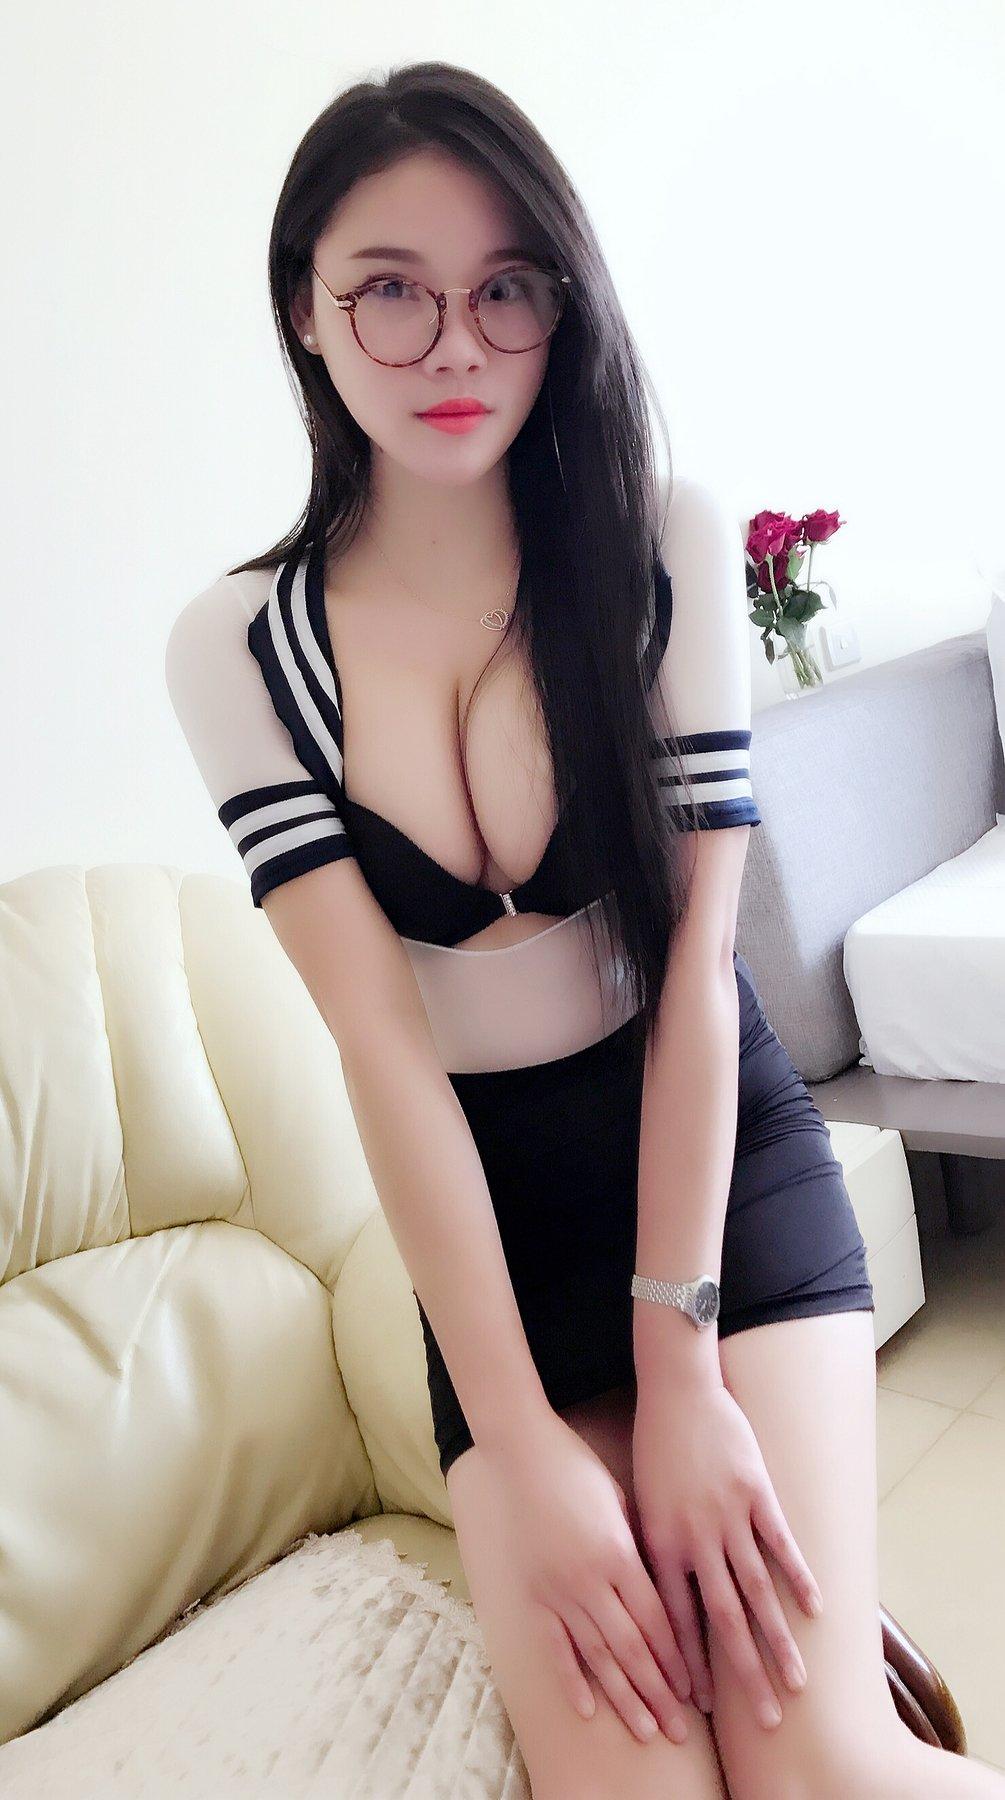 japanese escorts hot  escort